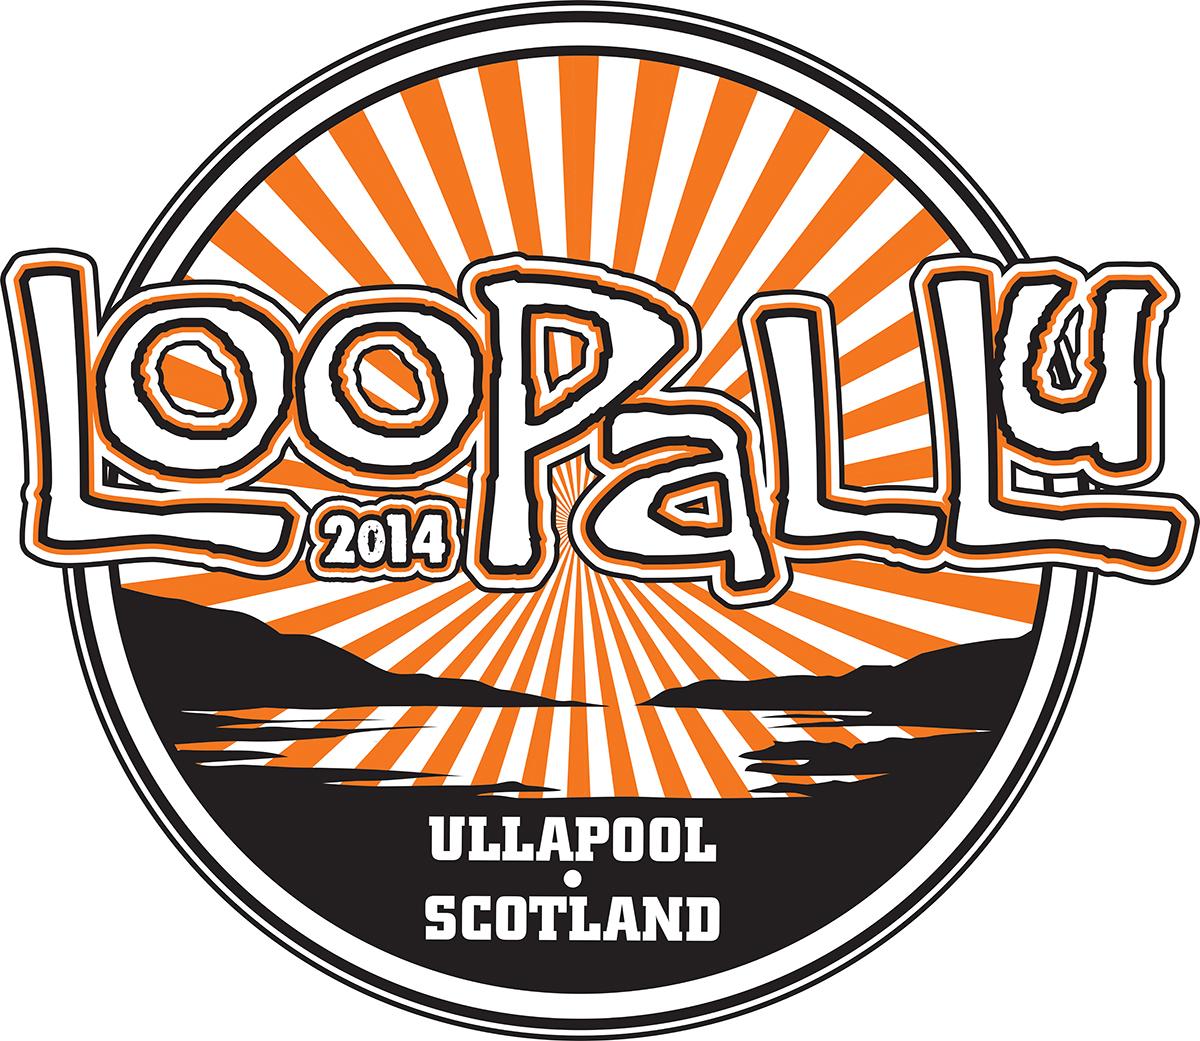 Loopallu